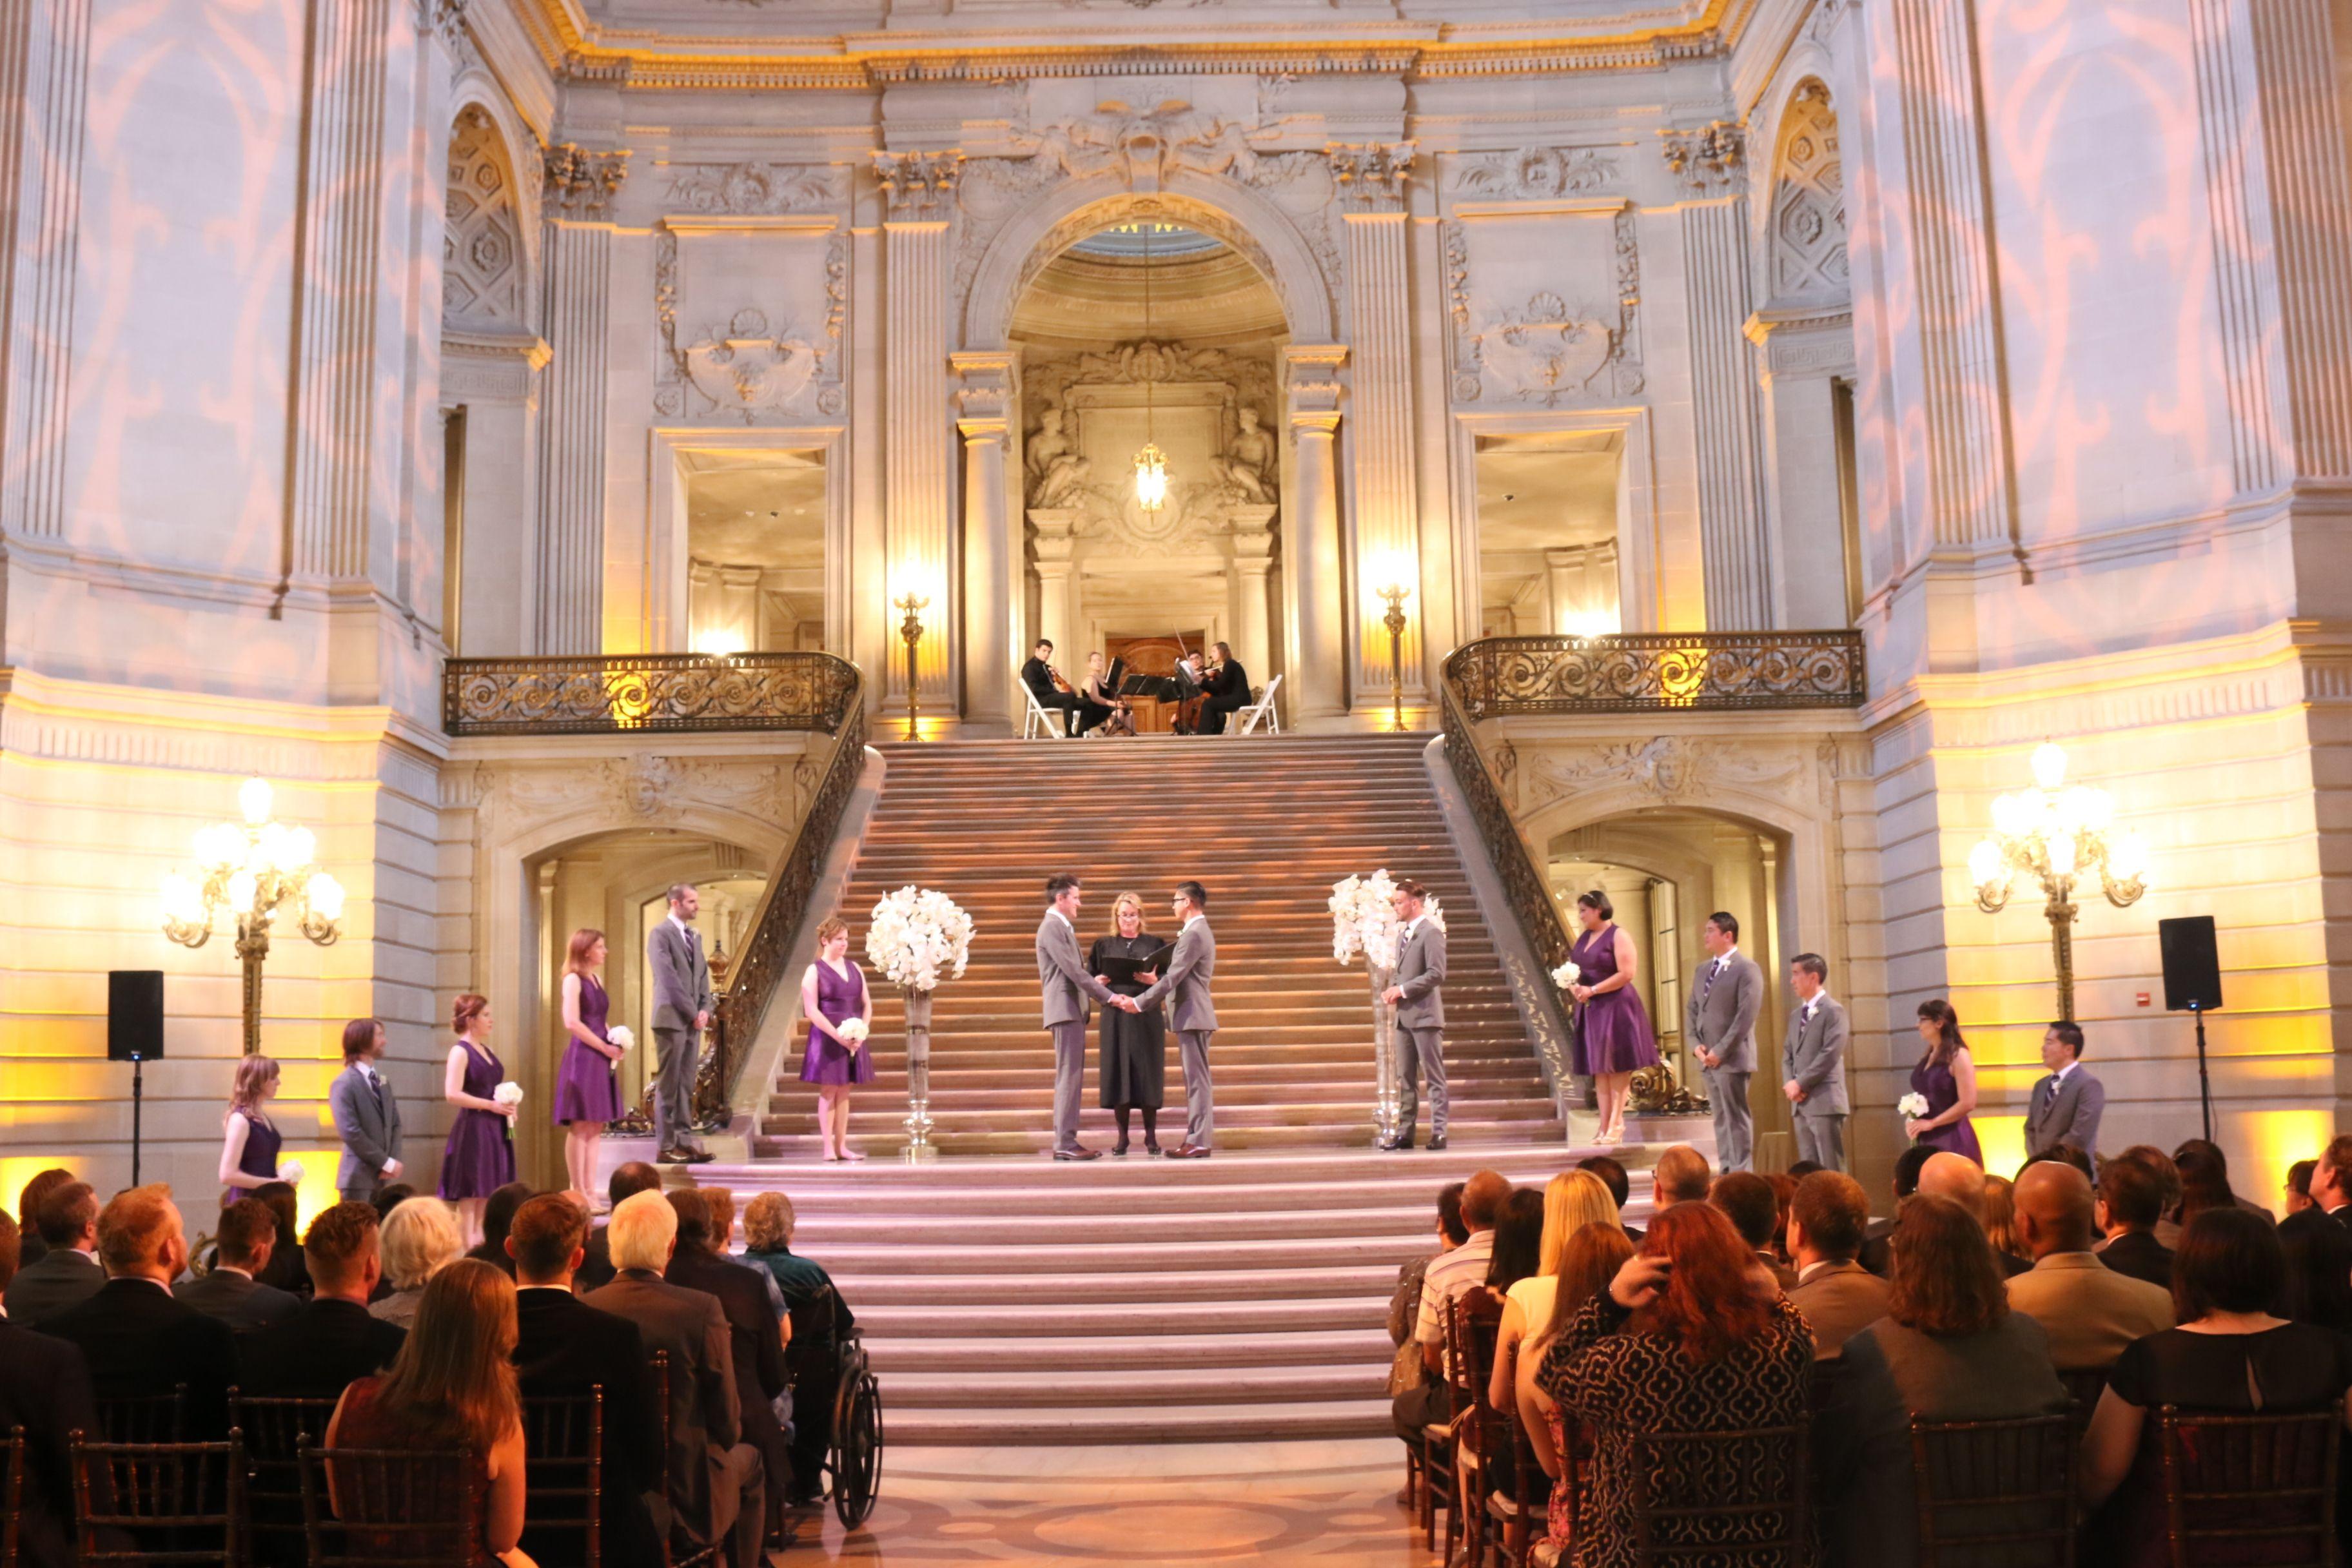 Mark And Shay S Wedding At San Francisco City Hall Rotunda Provided Sound Lighting Ceremony Music Wireless Microphones Dj Twin Spin Dj Video House Dance